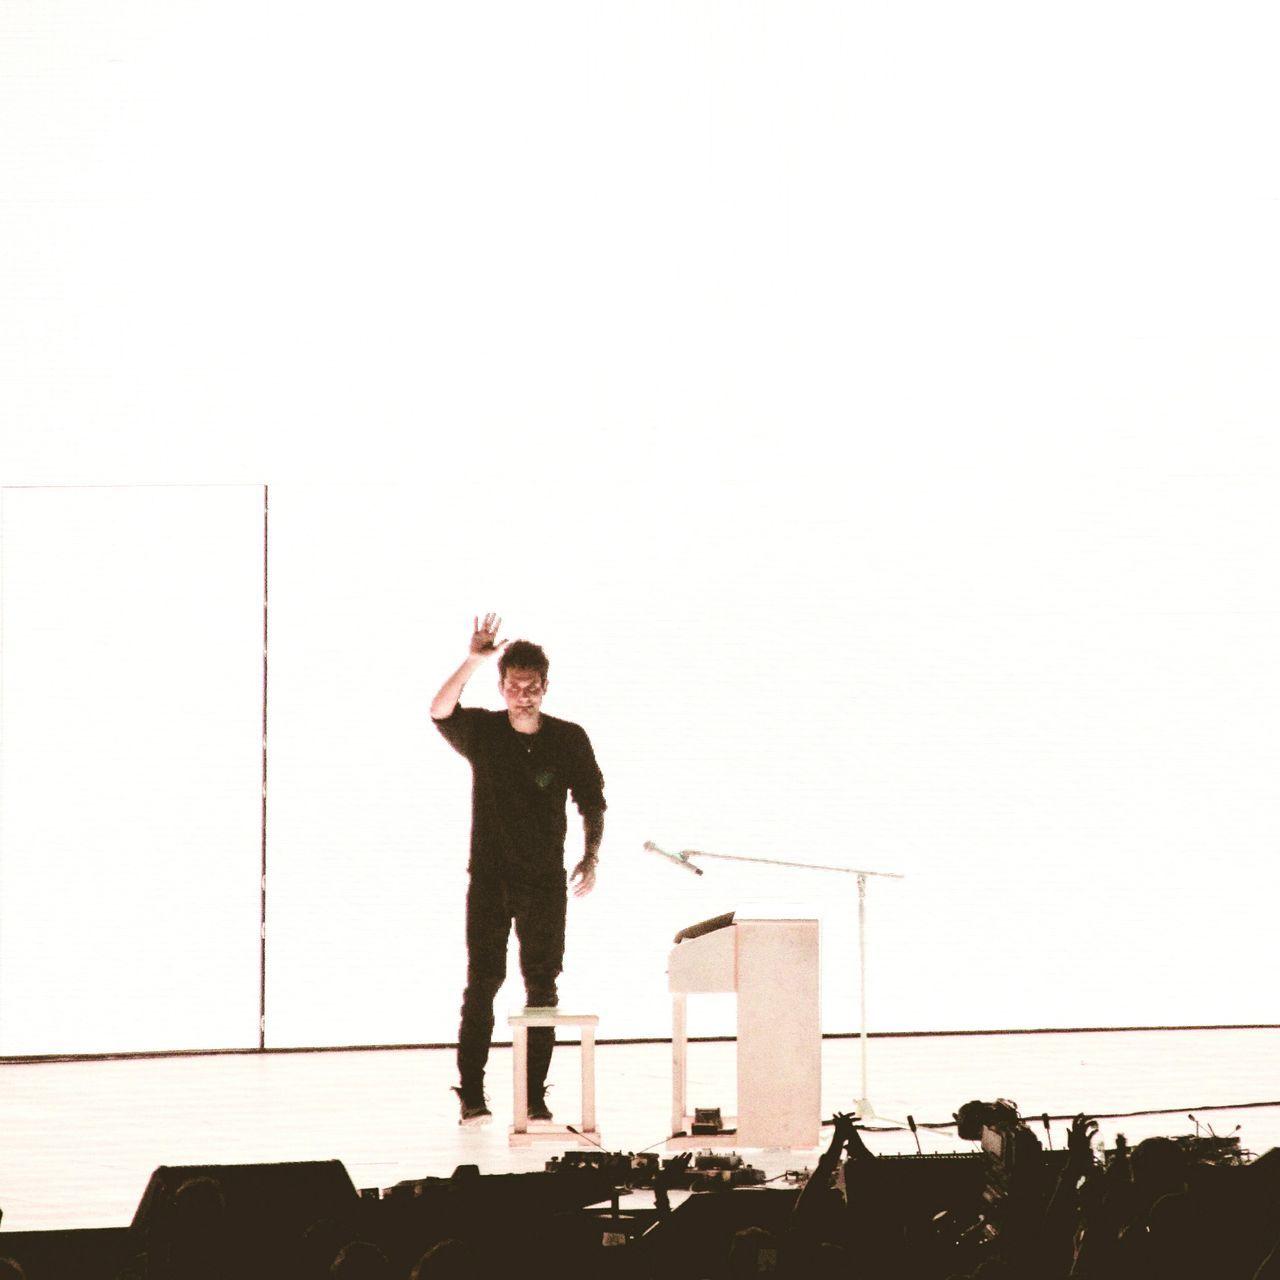 John Mayer O2 Arena O2 London Gig Concert Stage John Mayer Live